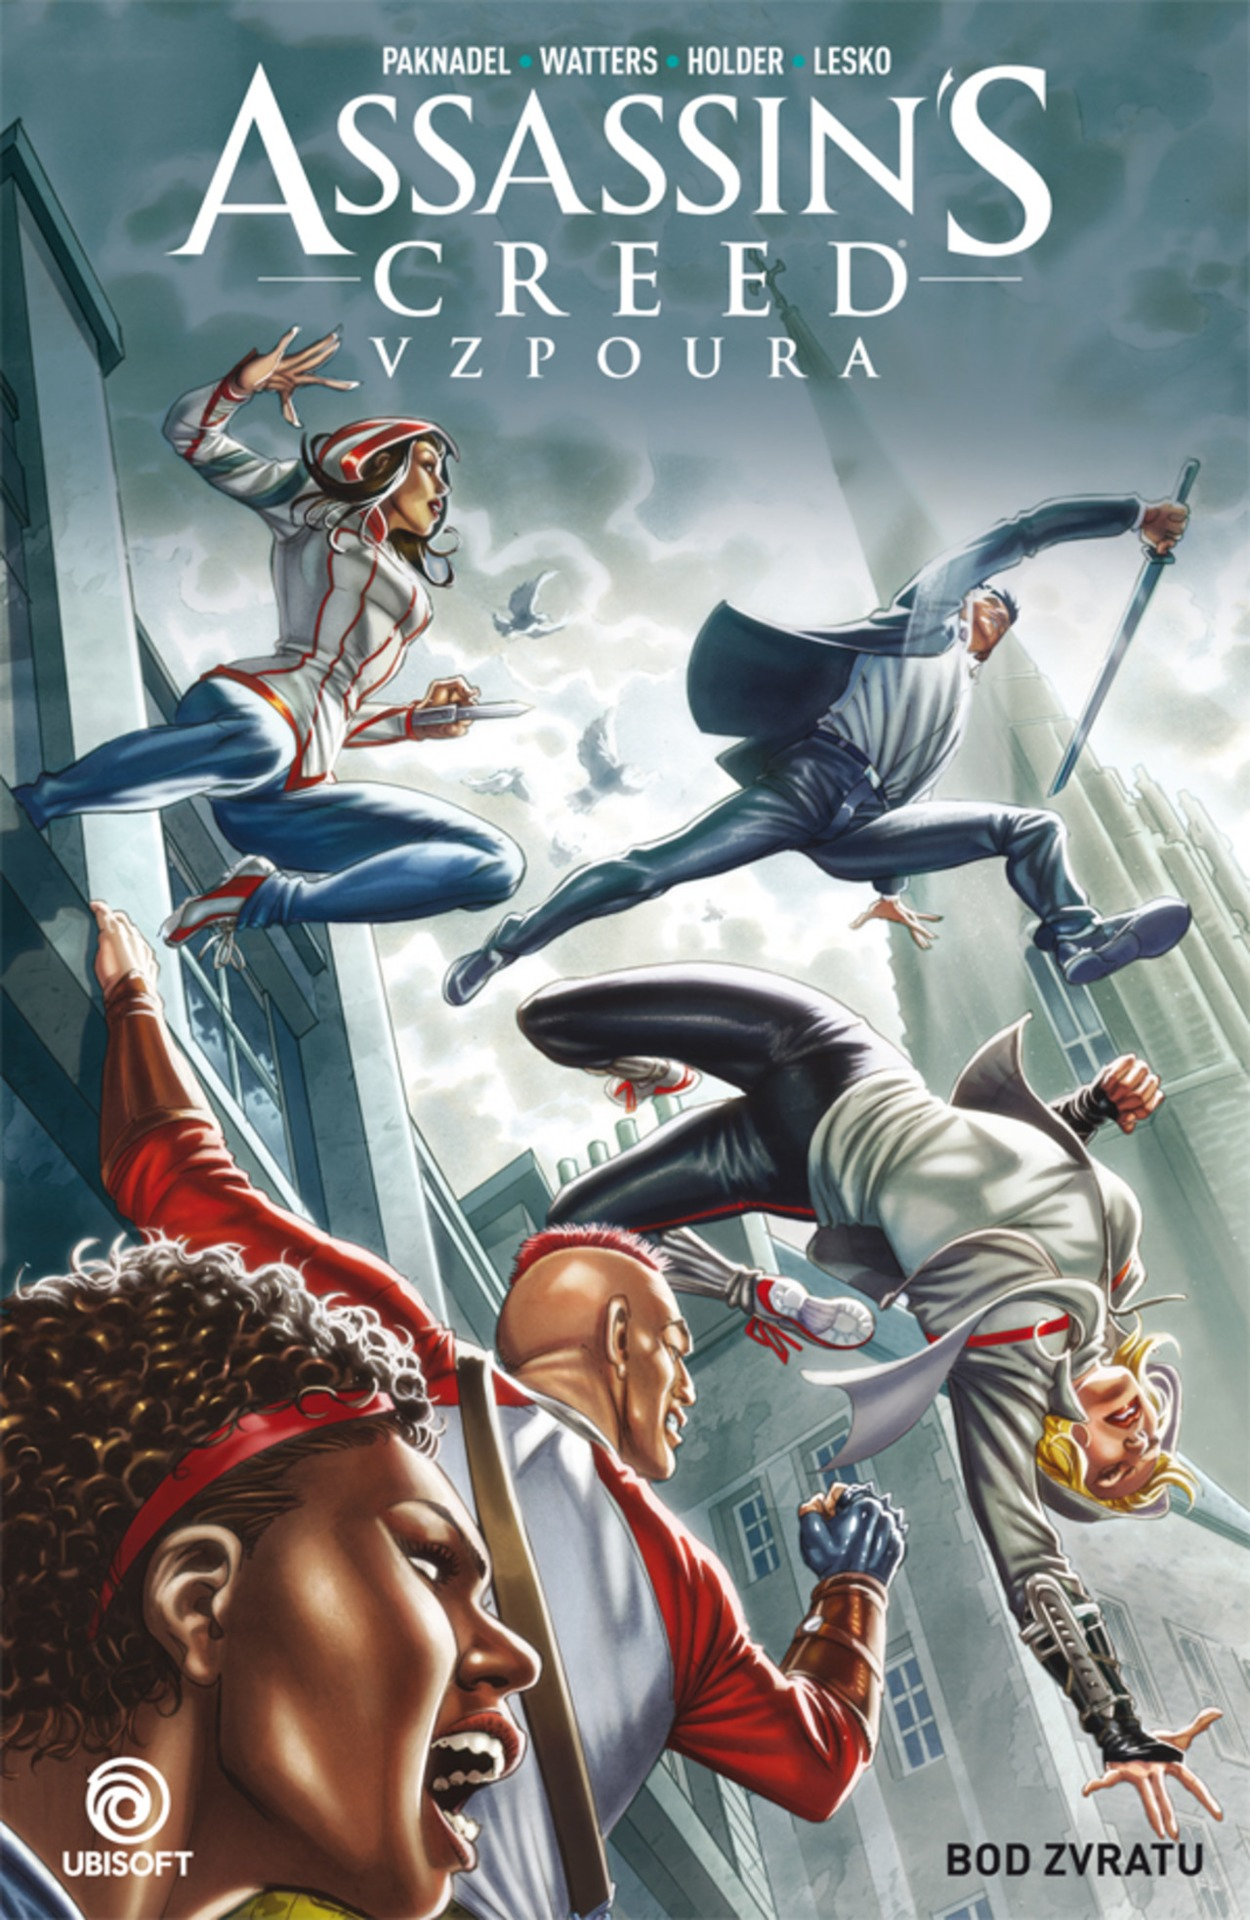 Komiks Assassins Creed: Vzpoura 2 - Bod zvratu (PC)